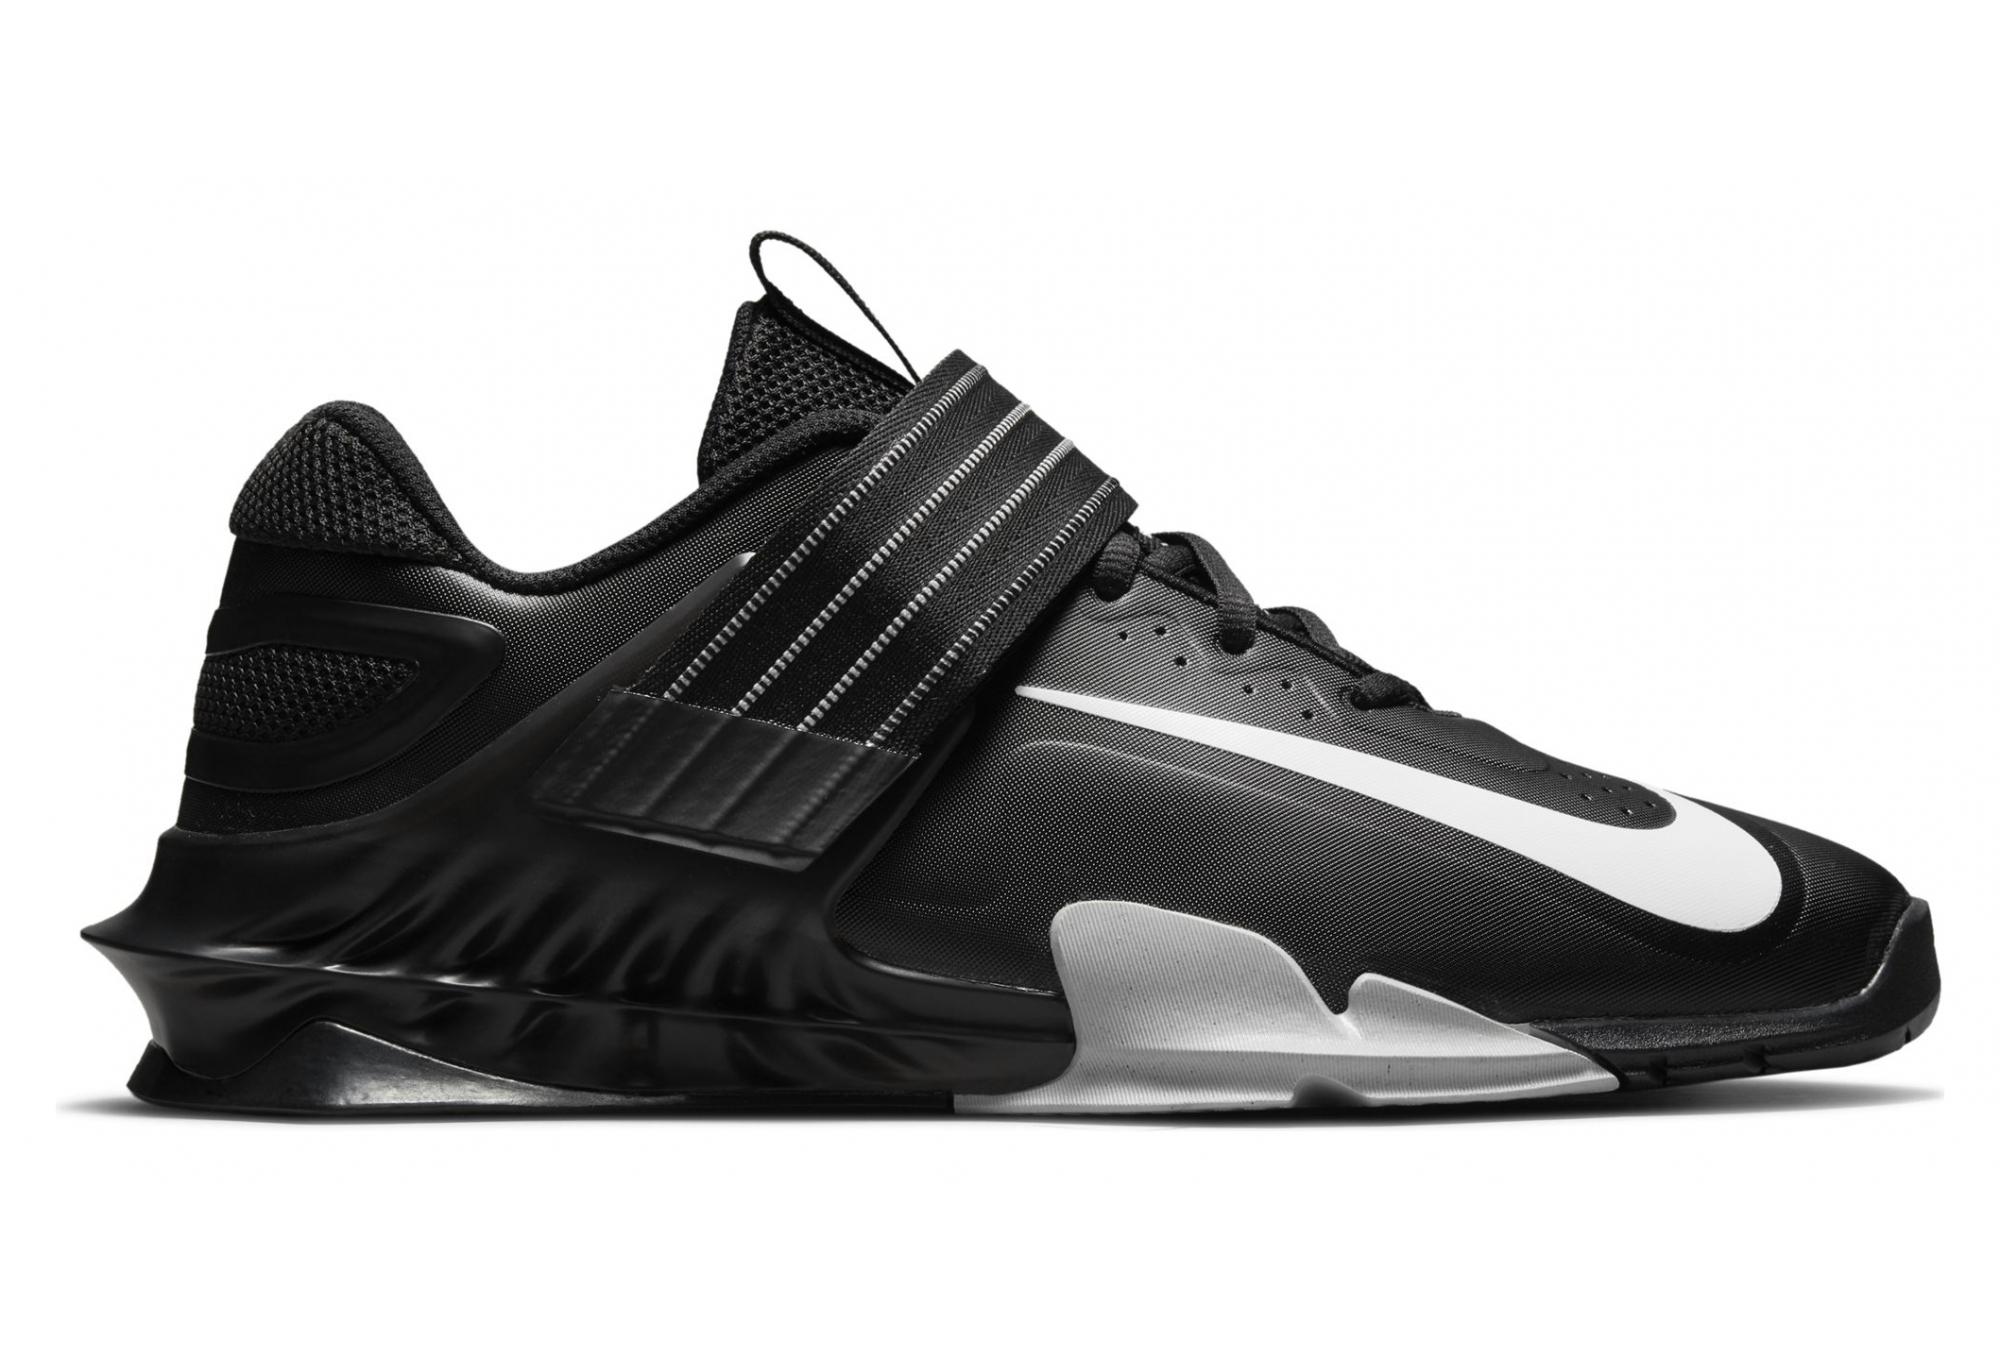 Pair of Shoes Nike Savaleos Black Unisex | Alltricks.com